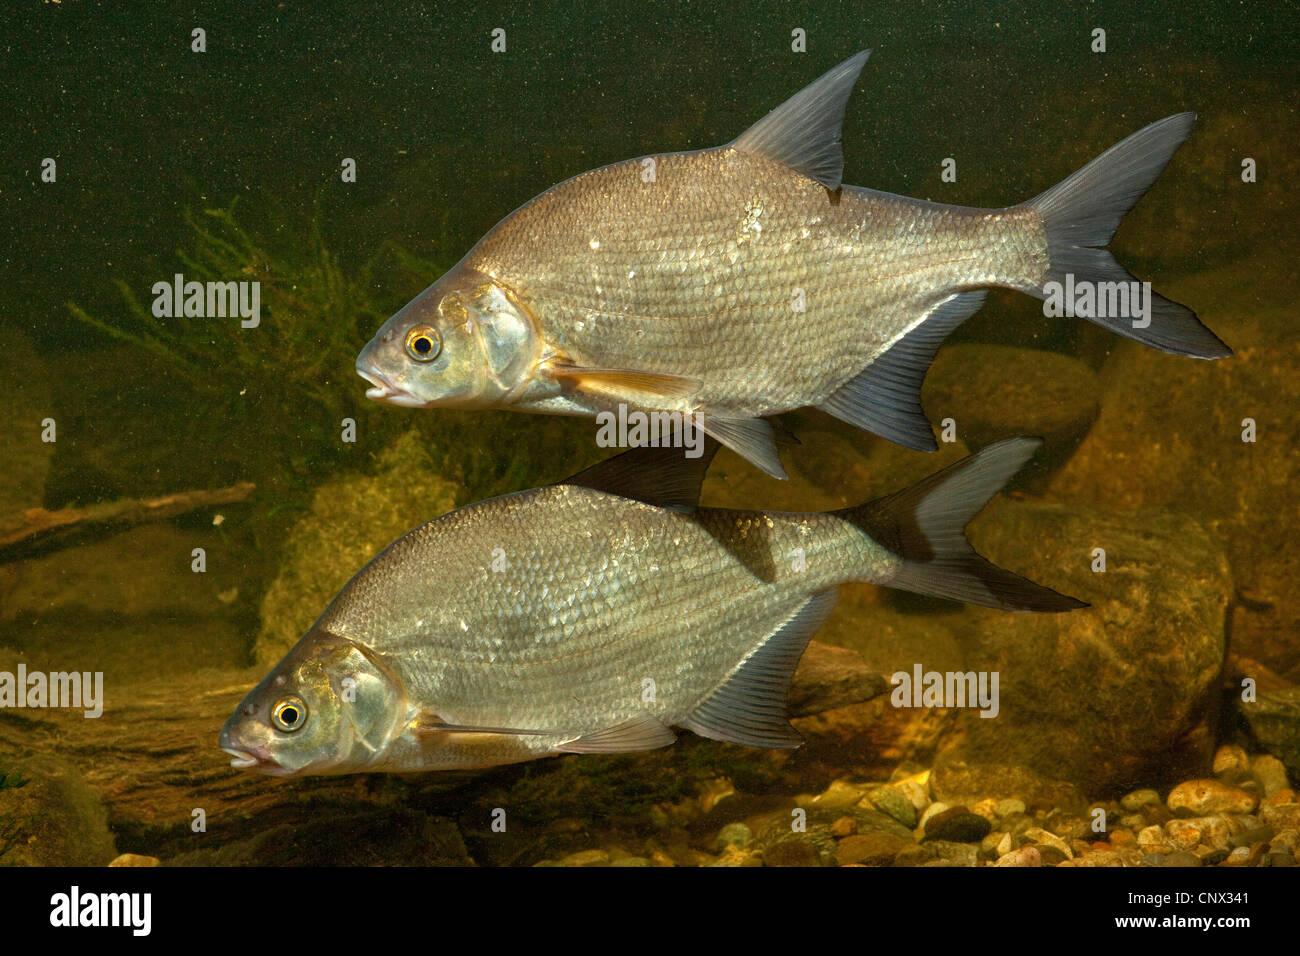 Freshwater fish bream -  Common Bream Freshwater Bream Carp Bream Abramis Brama Two Fishes Swimming